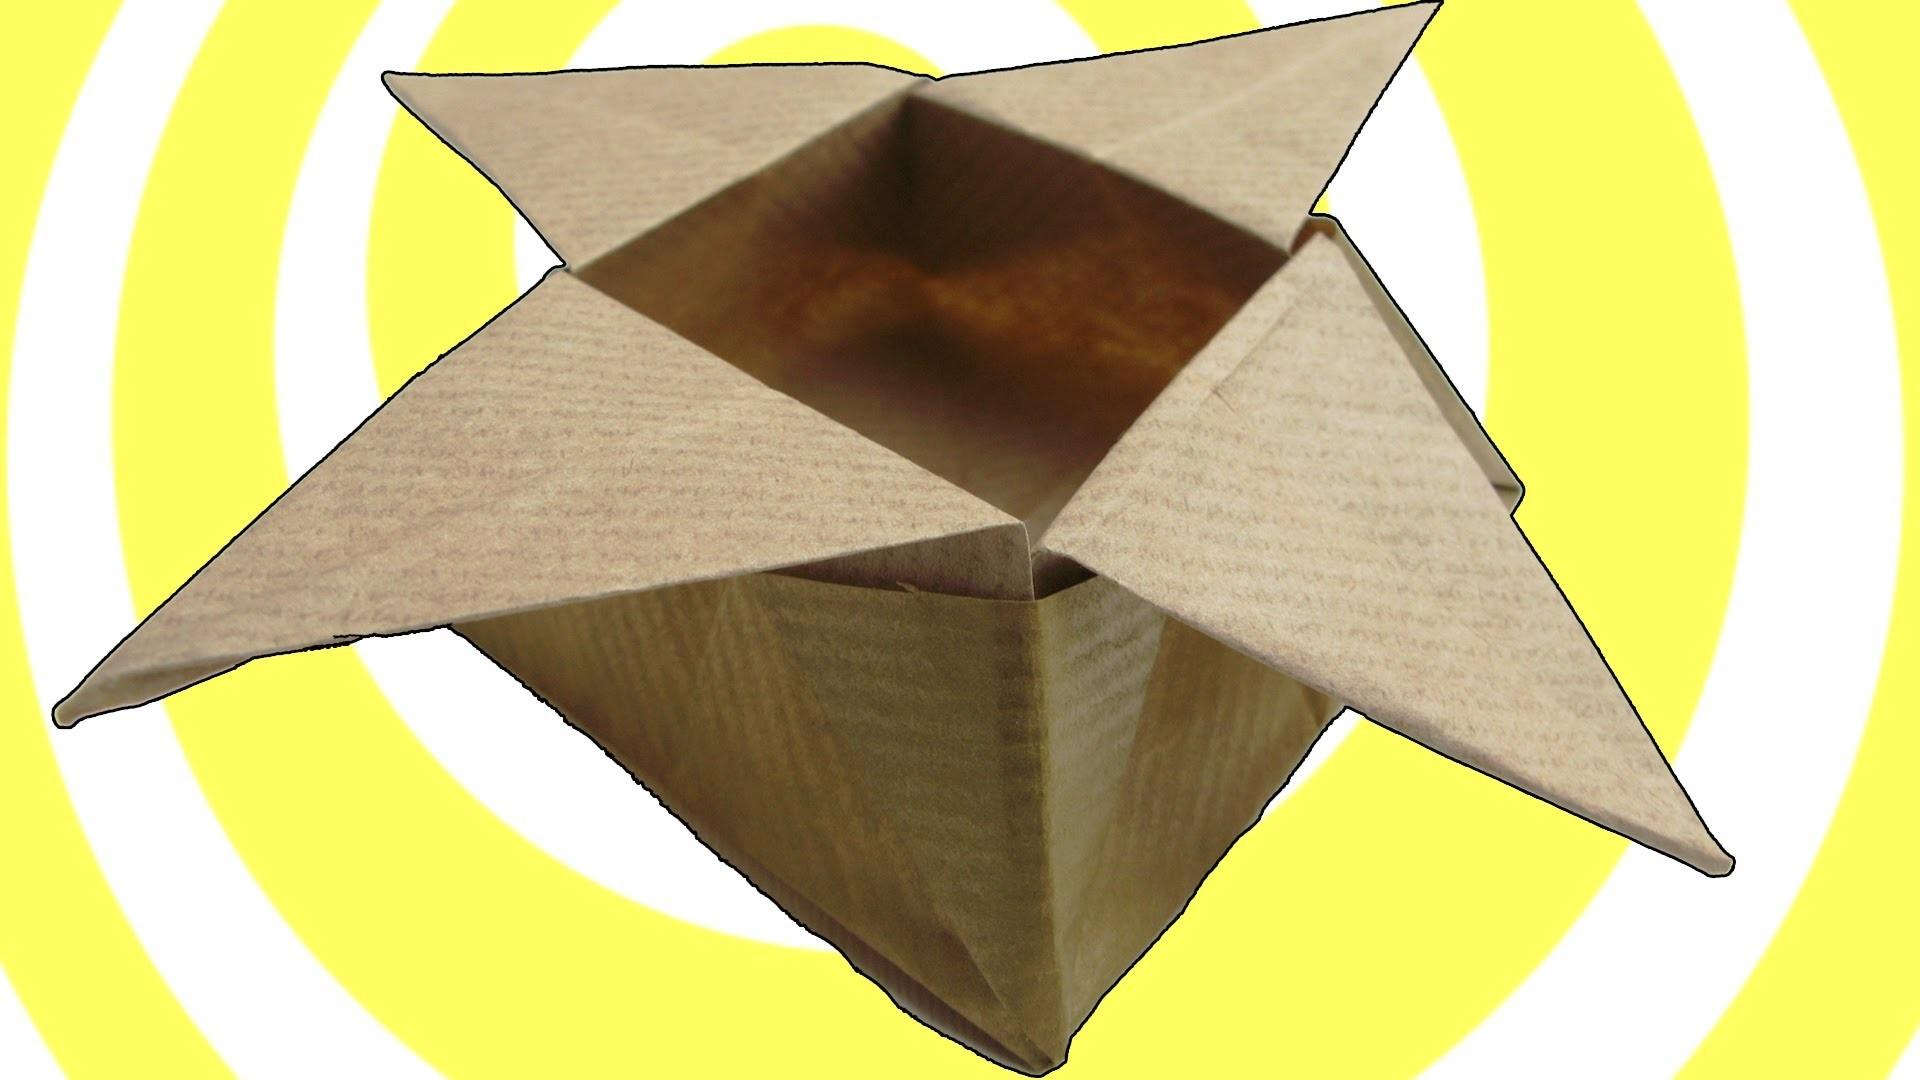 Origami Star Box (easy origami)